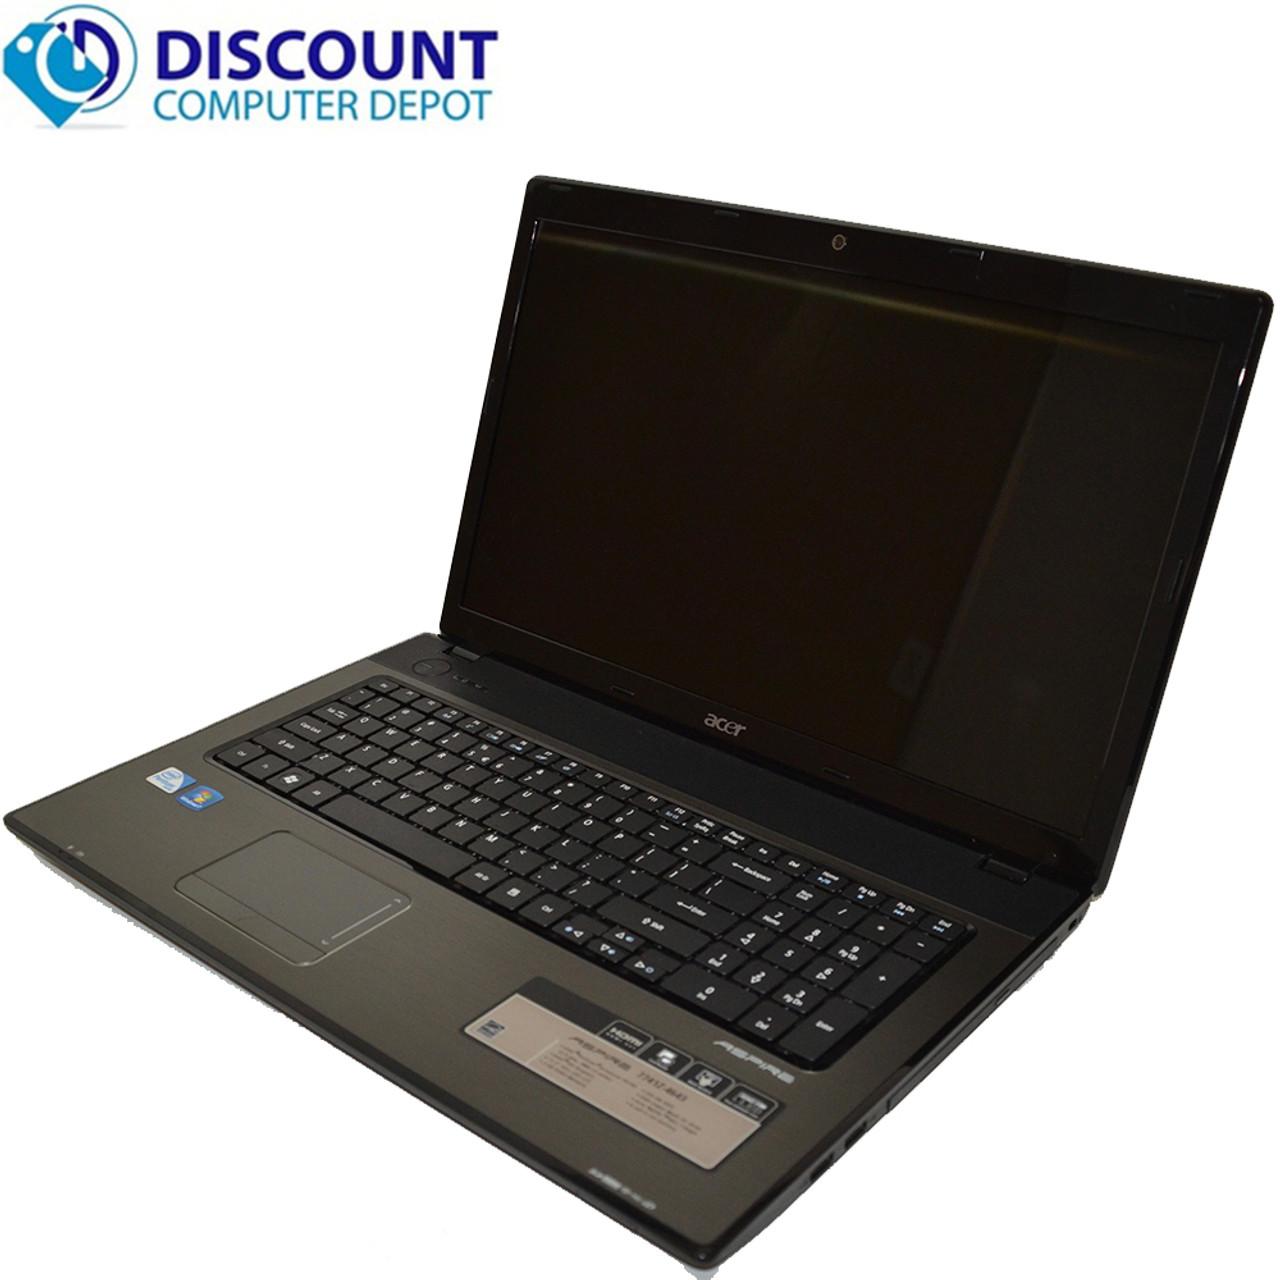 Acer Aspire 7741 Notebook Intel WLAN Windows Vista 64-BIT